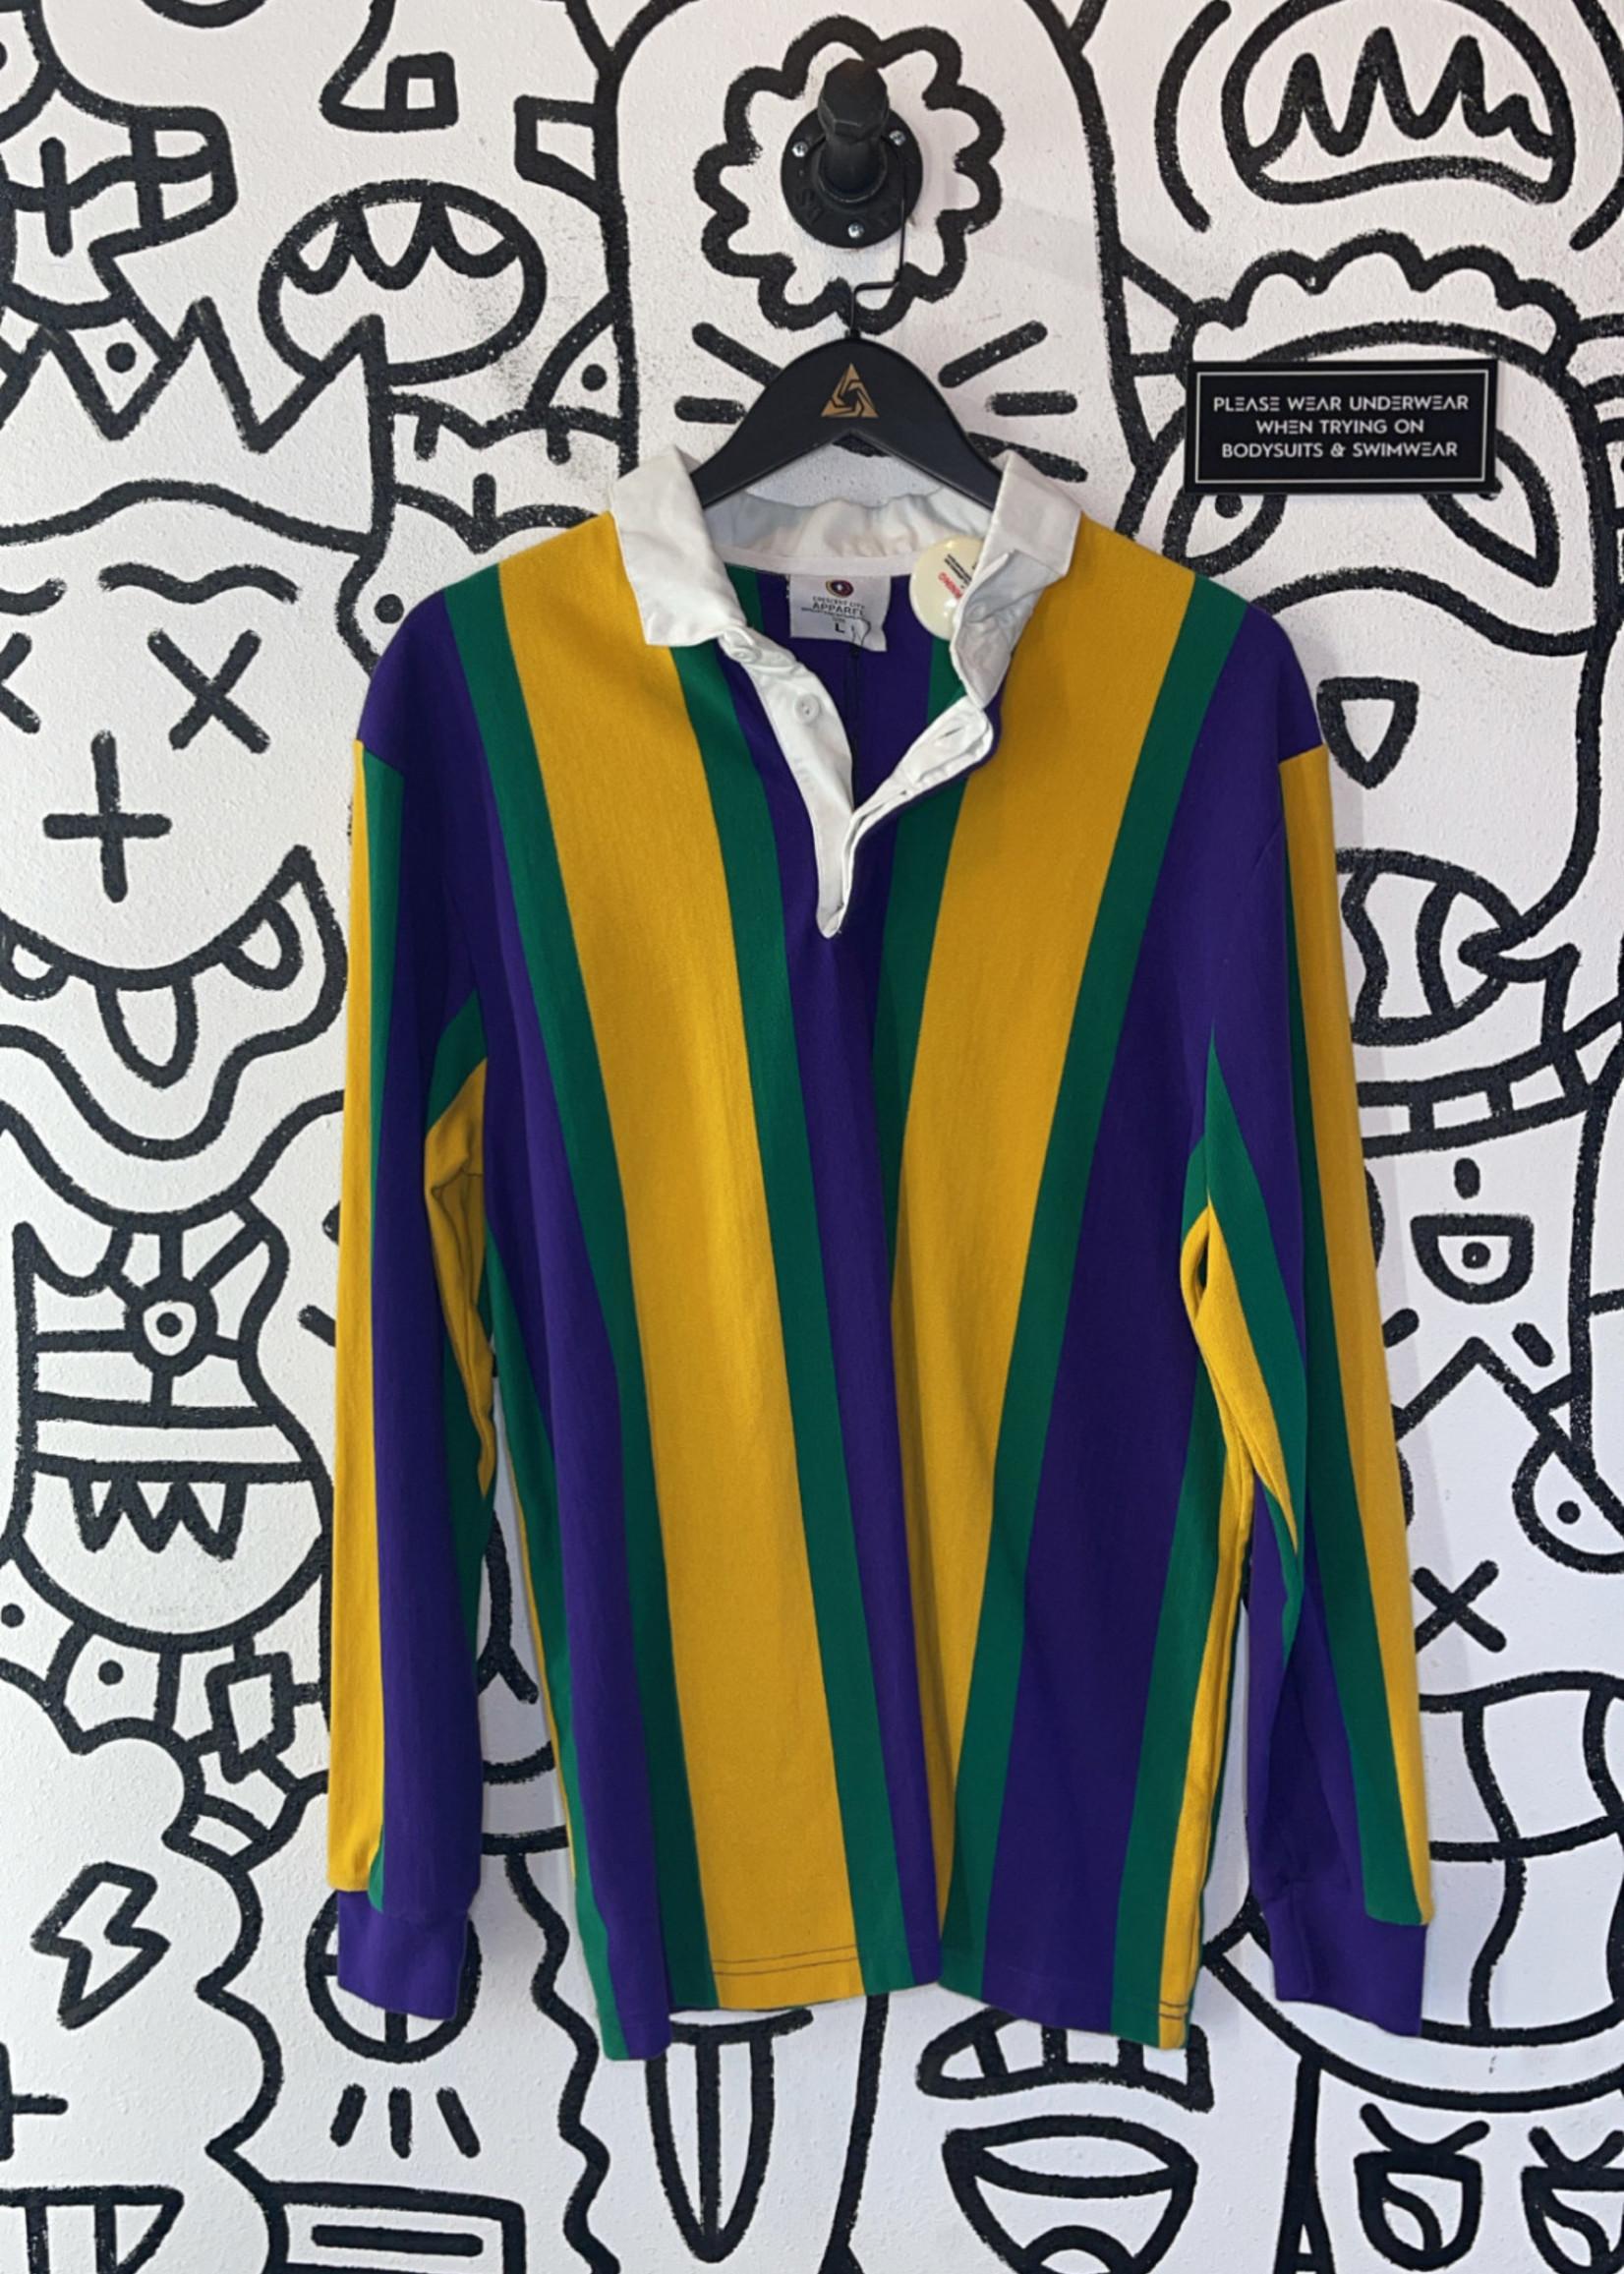 Vintage crescent city striped long sleeve L